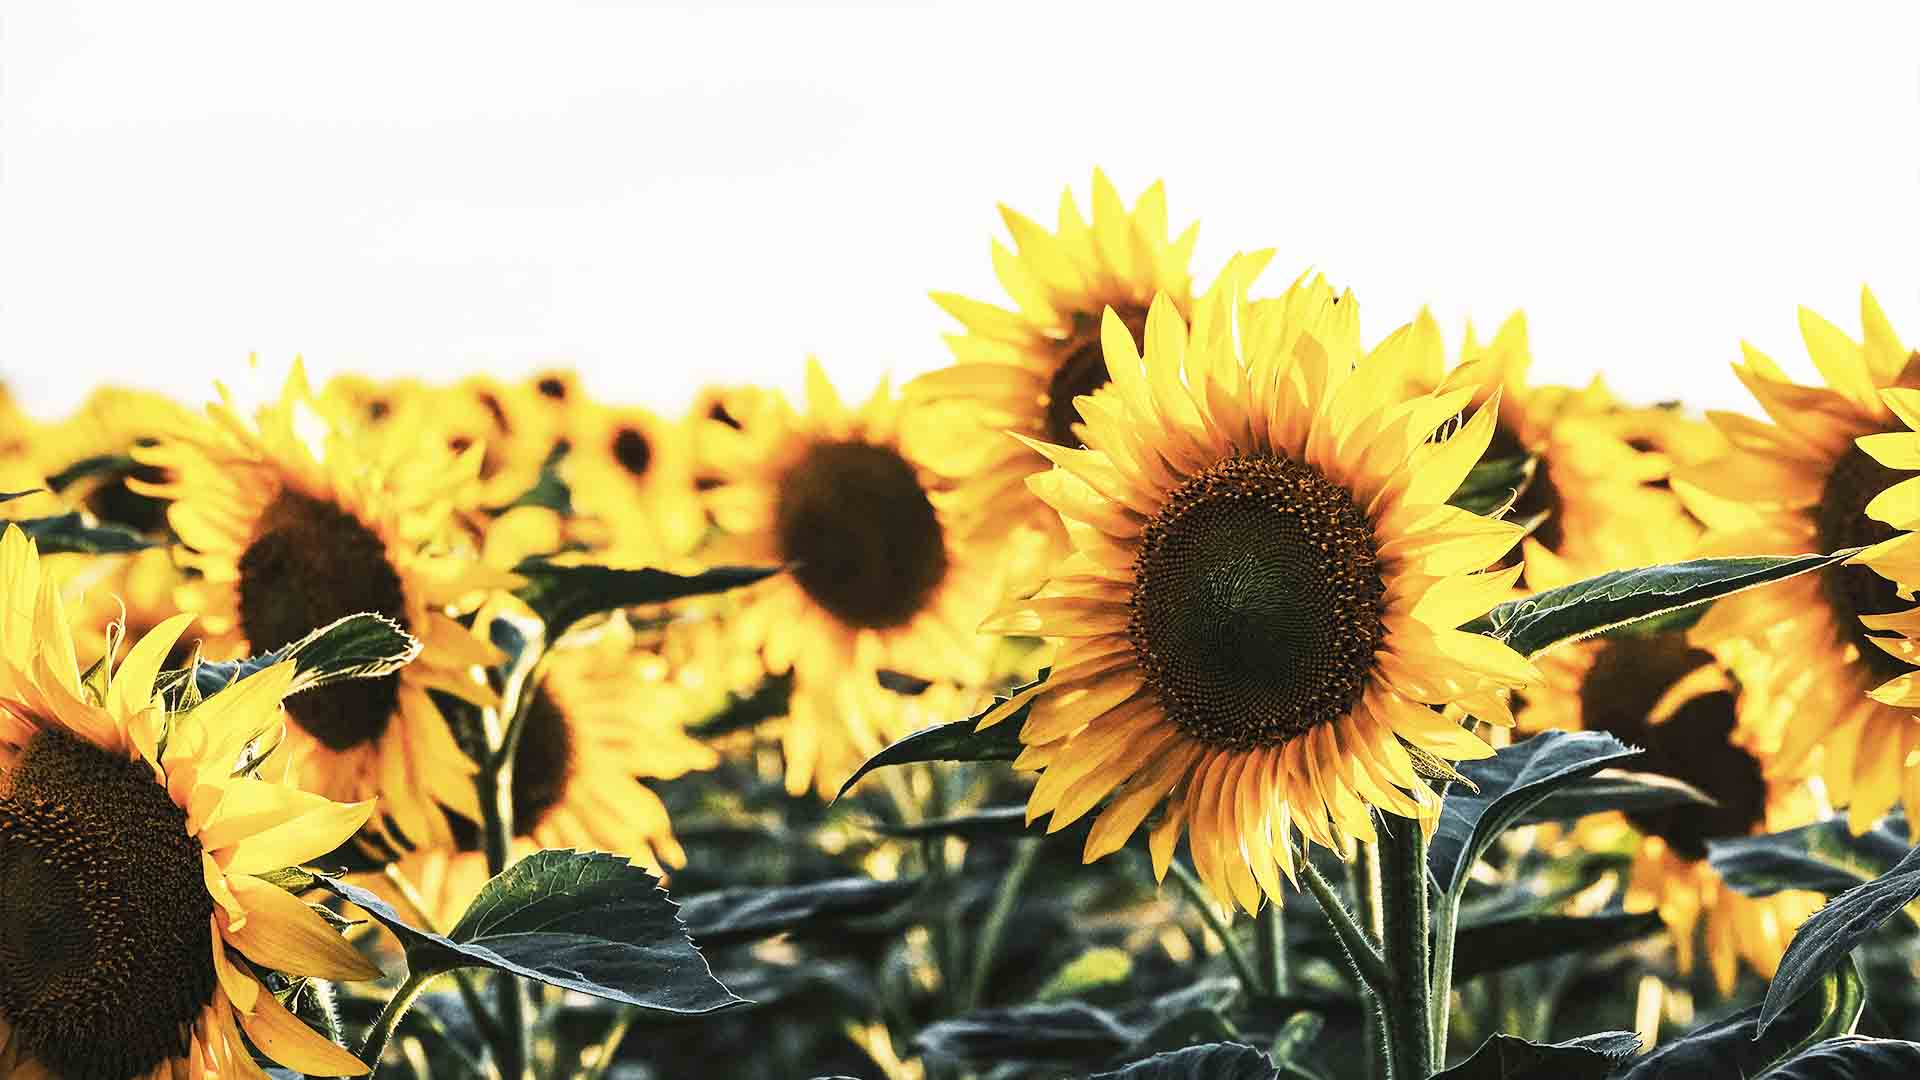 Huile de tournesol bienfaits fleur tournesol bio utilisation Roma Kaiuk